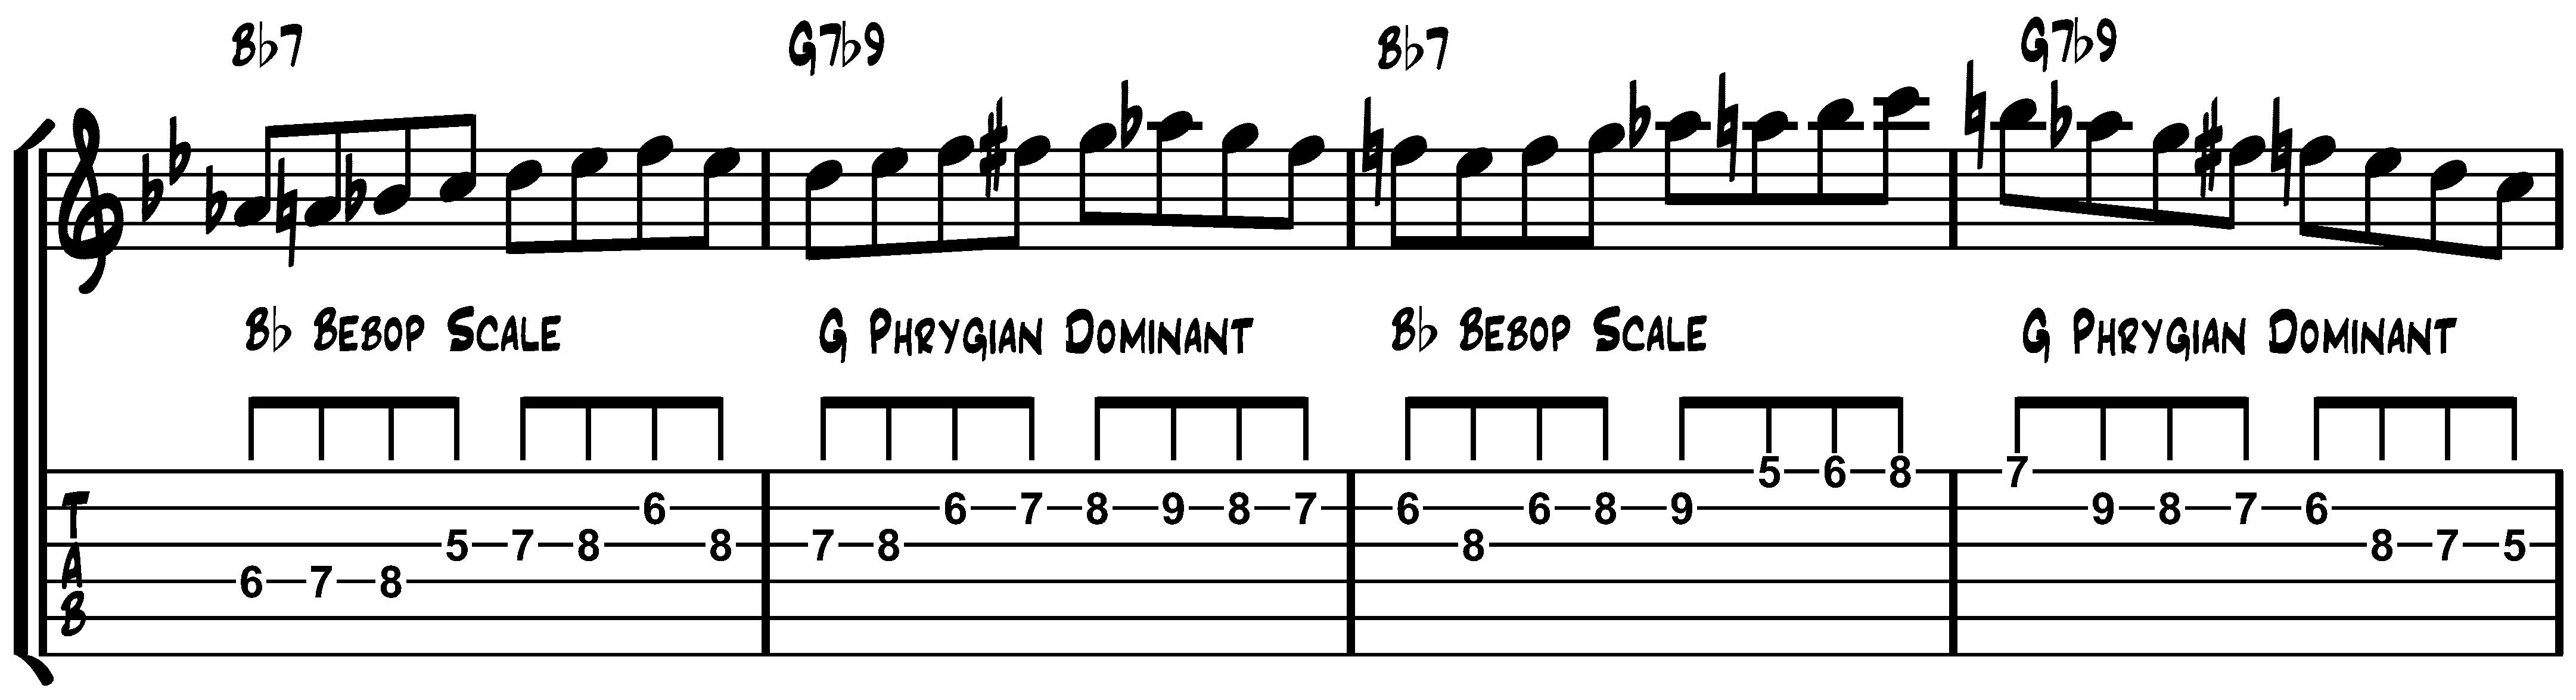 scale book muic jazz pdf